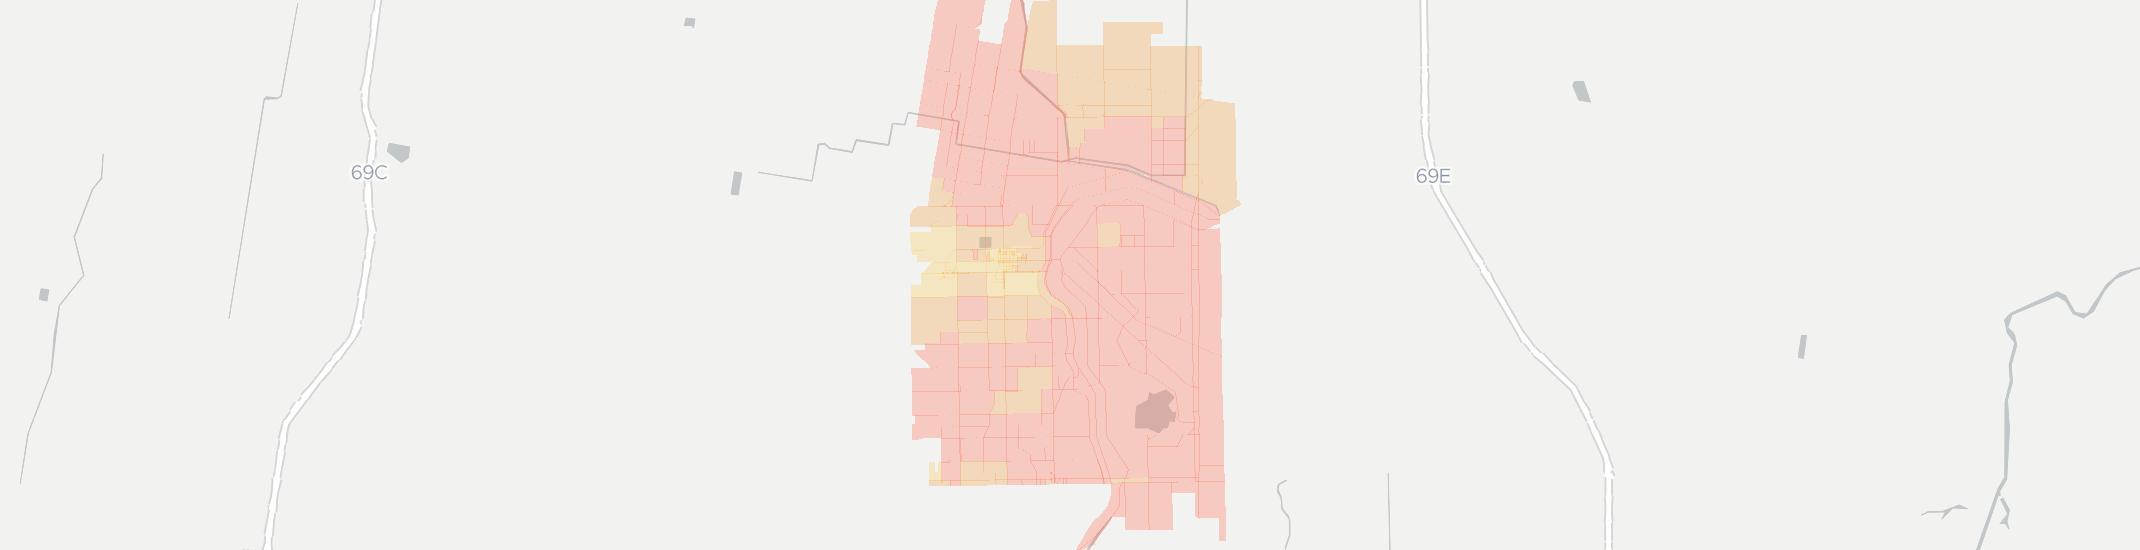 La Villa Internet Competition Map. Click for interactive map.